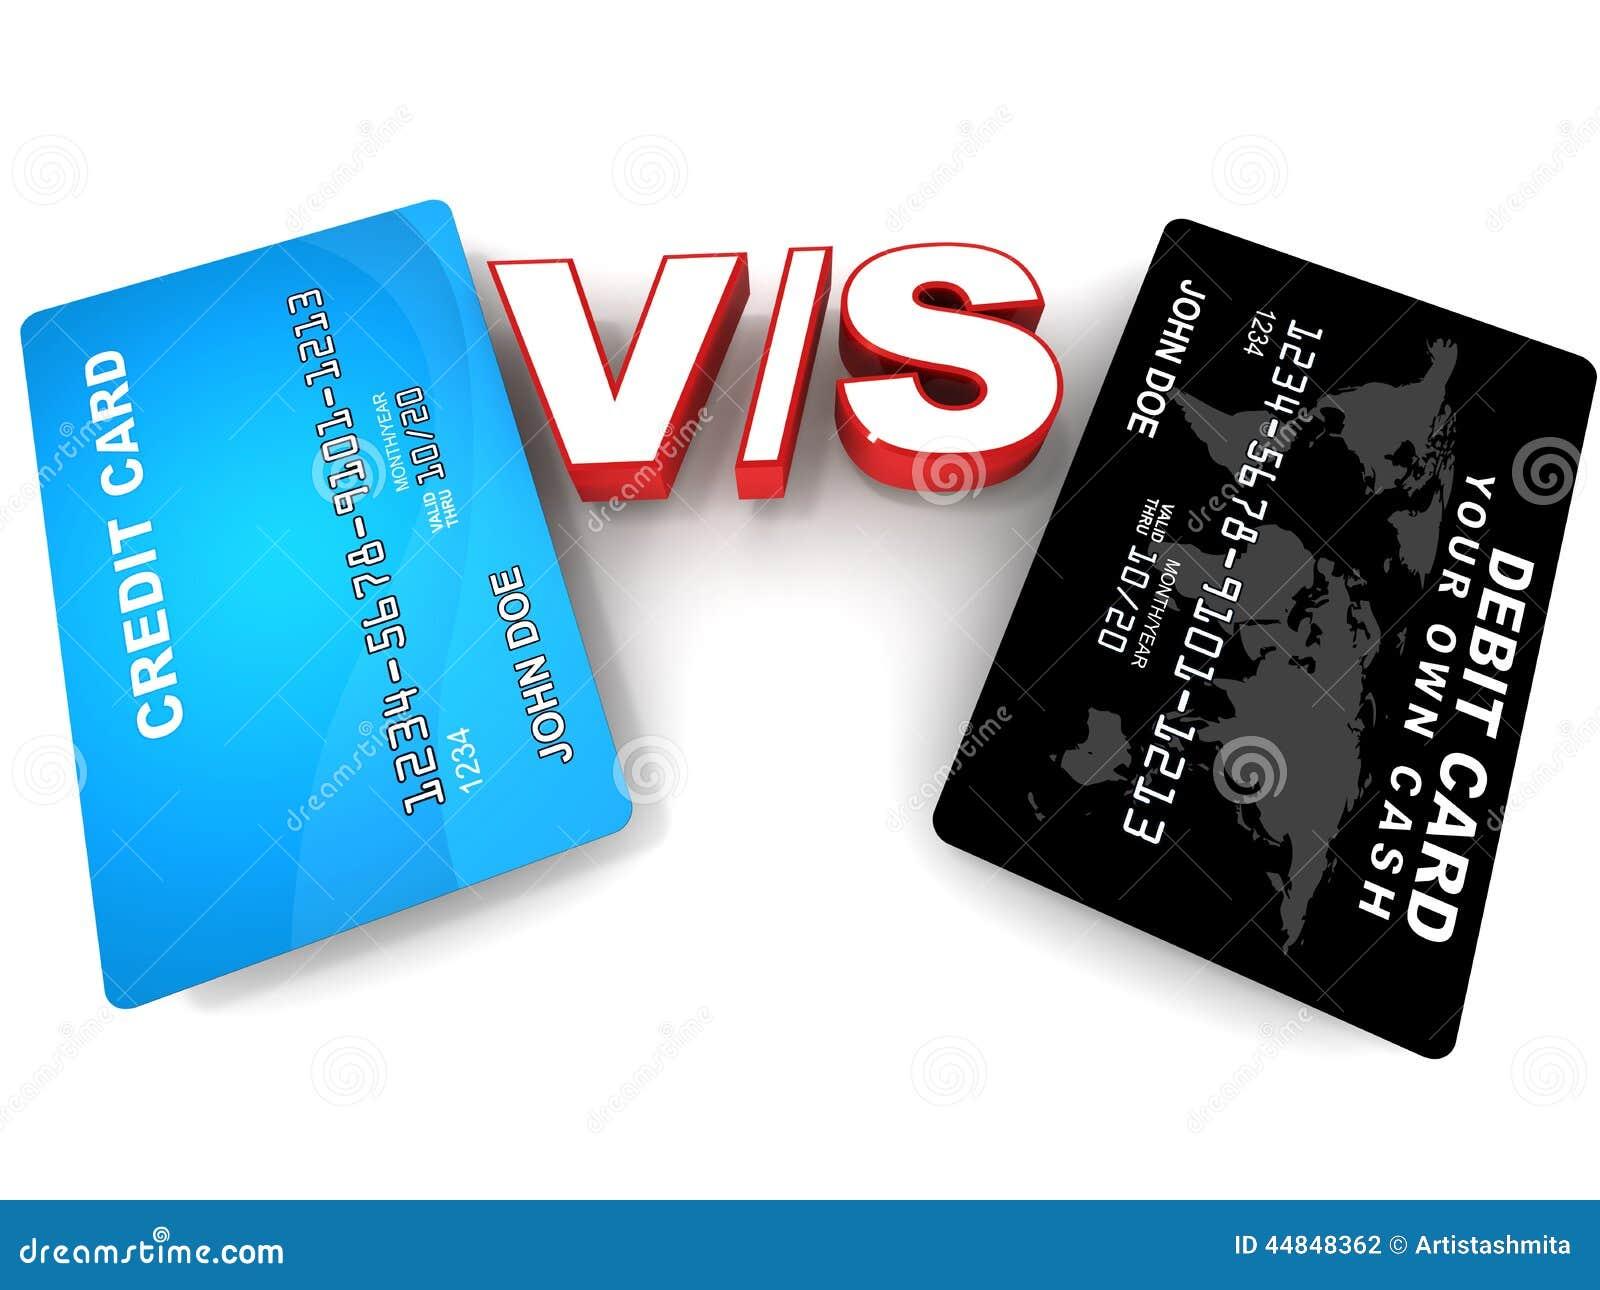 Debit versus credit card stock illustration image of finances 44848362 - Shopping cash card paying spending ...